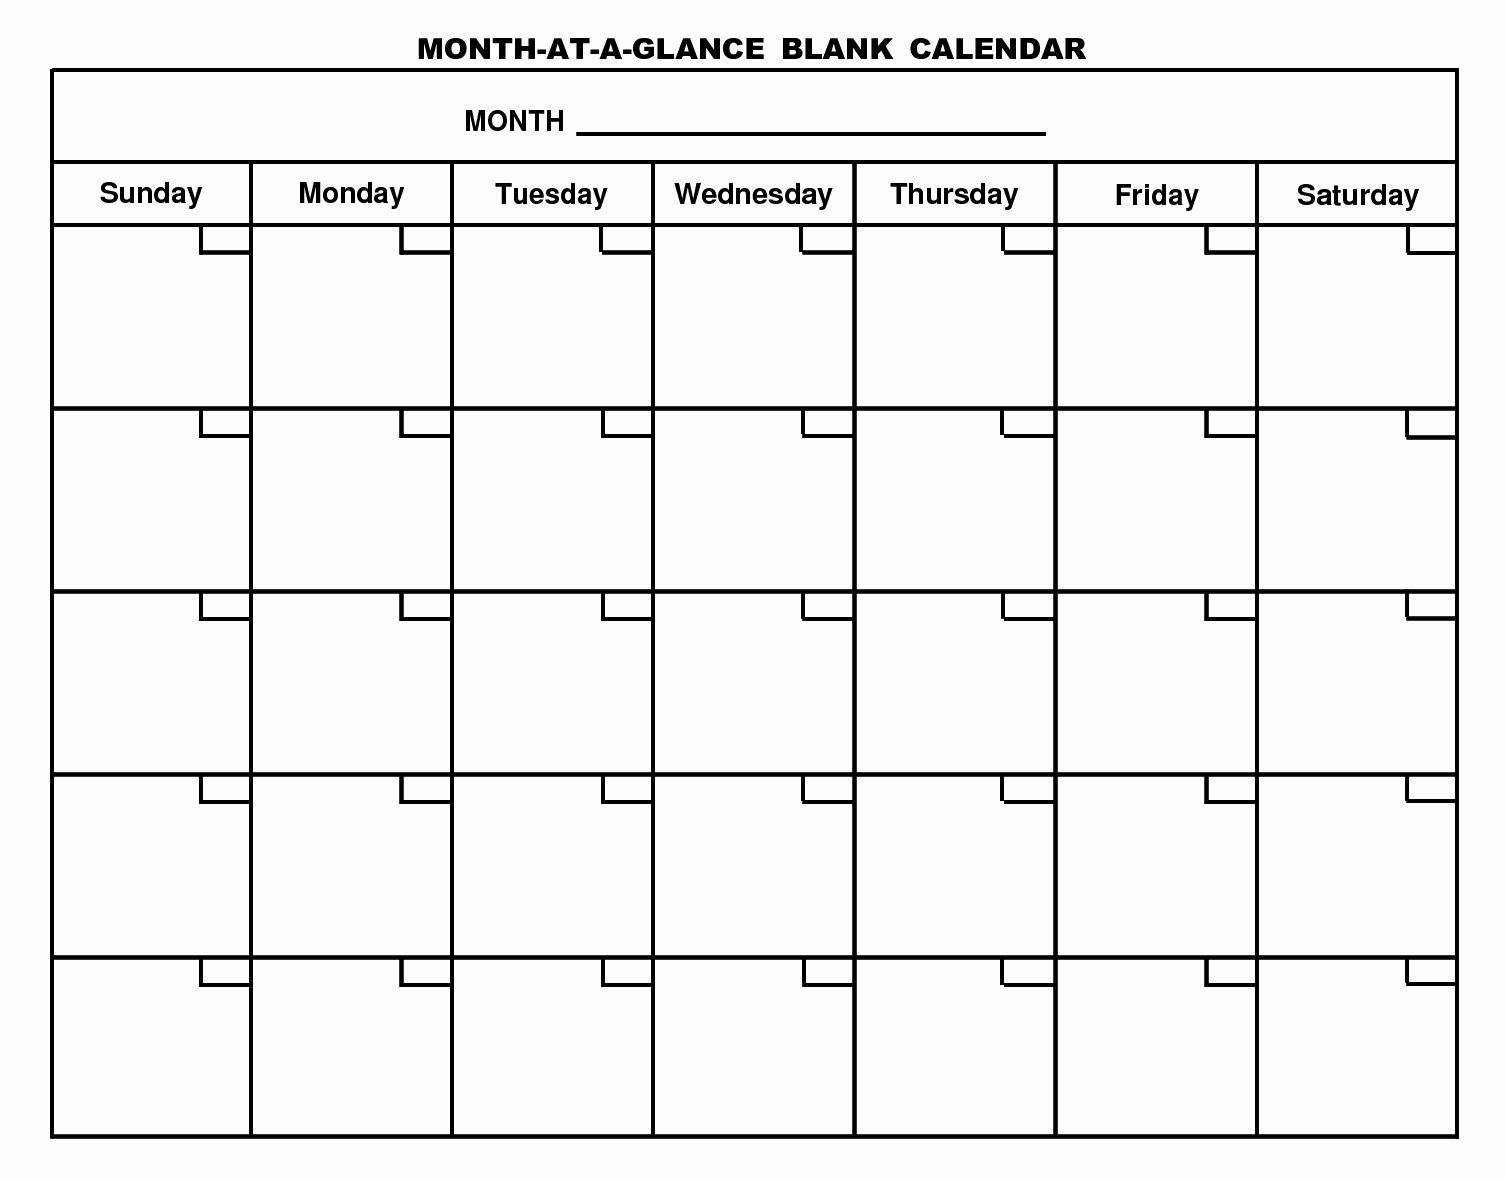 2017 Calendar Template Word Document Luxury Monthly Calendar Template 2017 Word